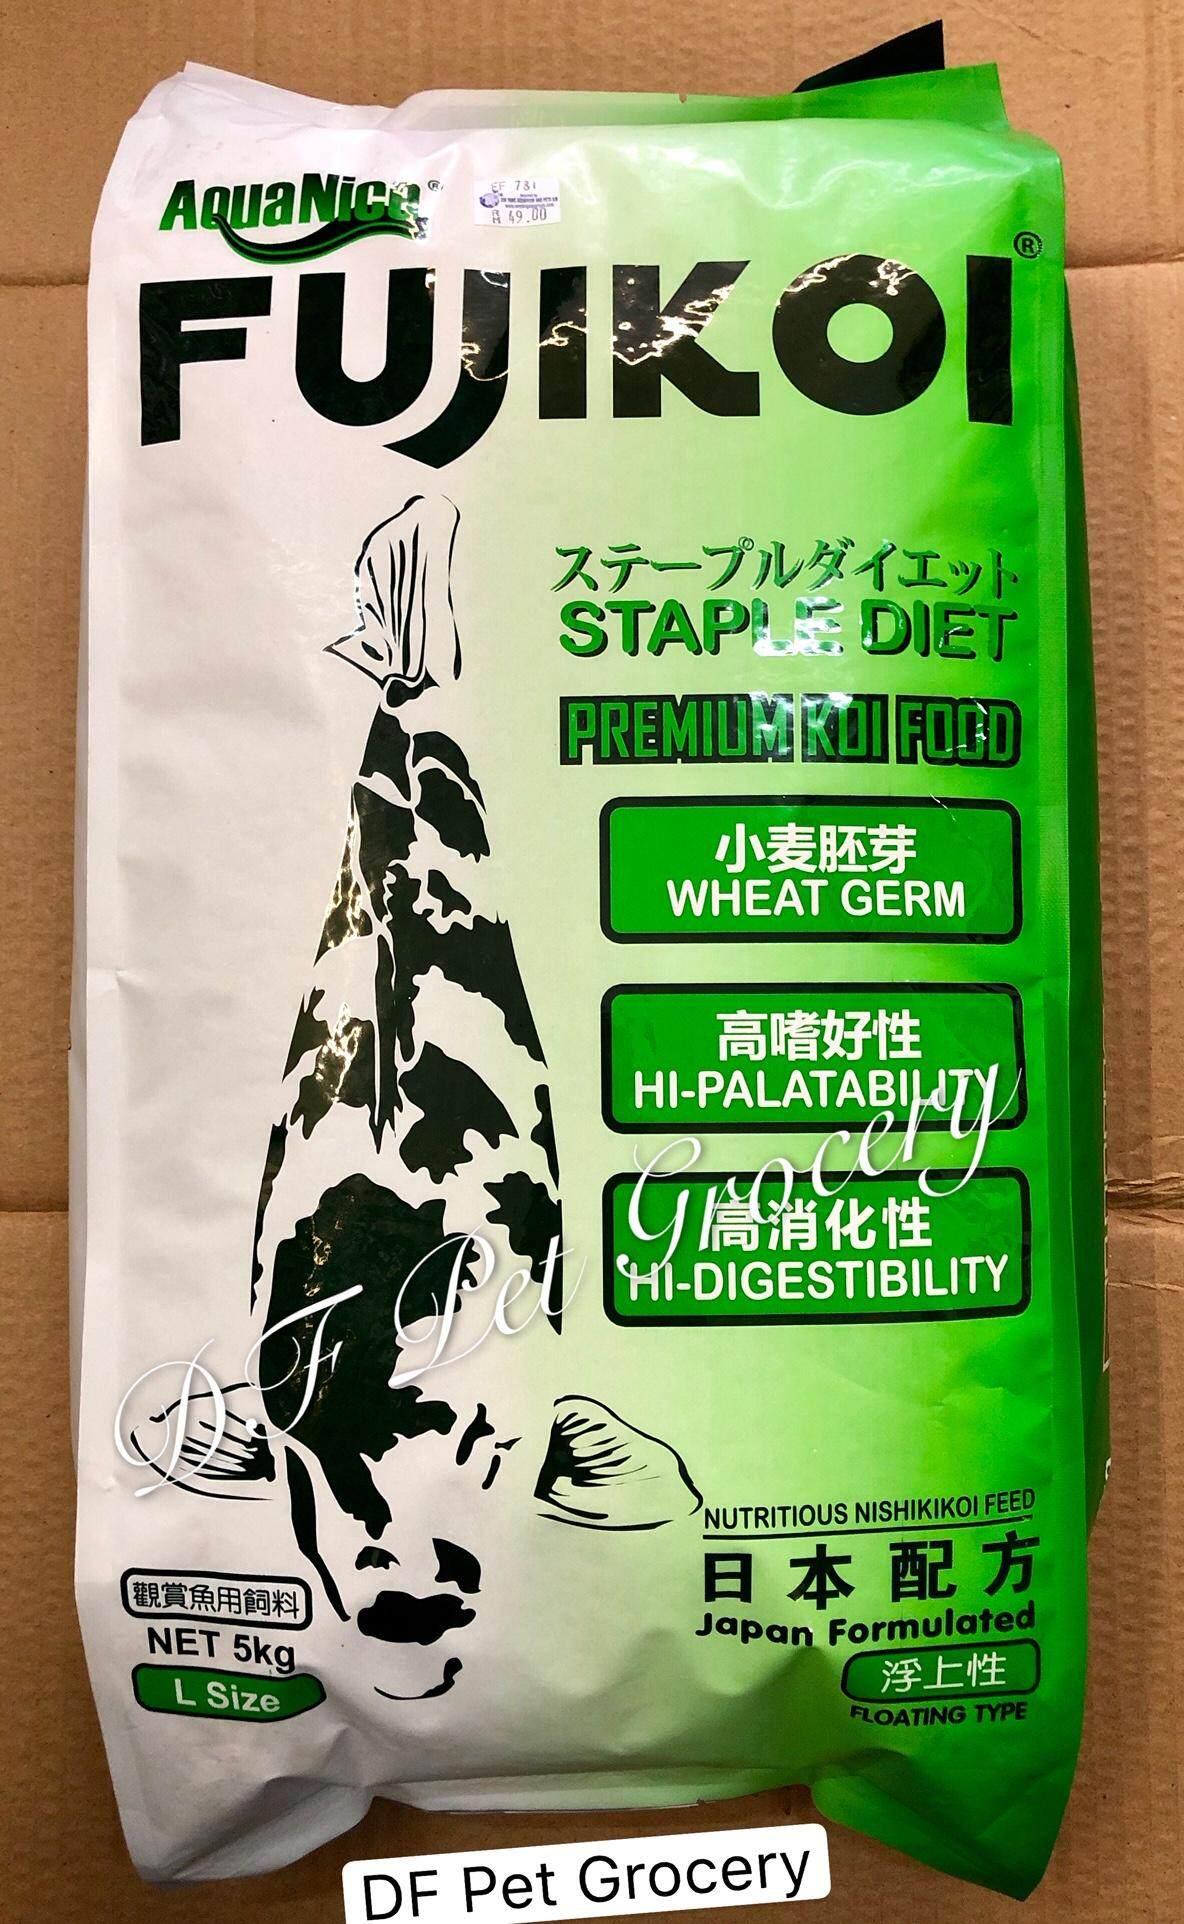 AquaNice Fujikoi Staple Diet Fish Food 5kg L Size (FF781)100% Original